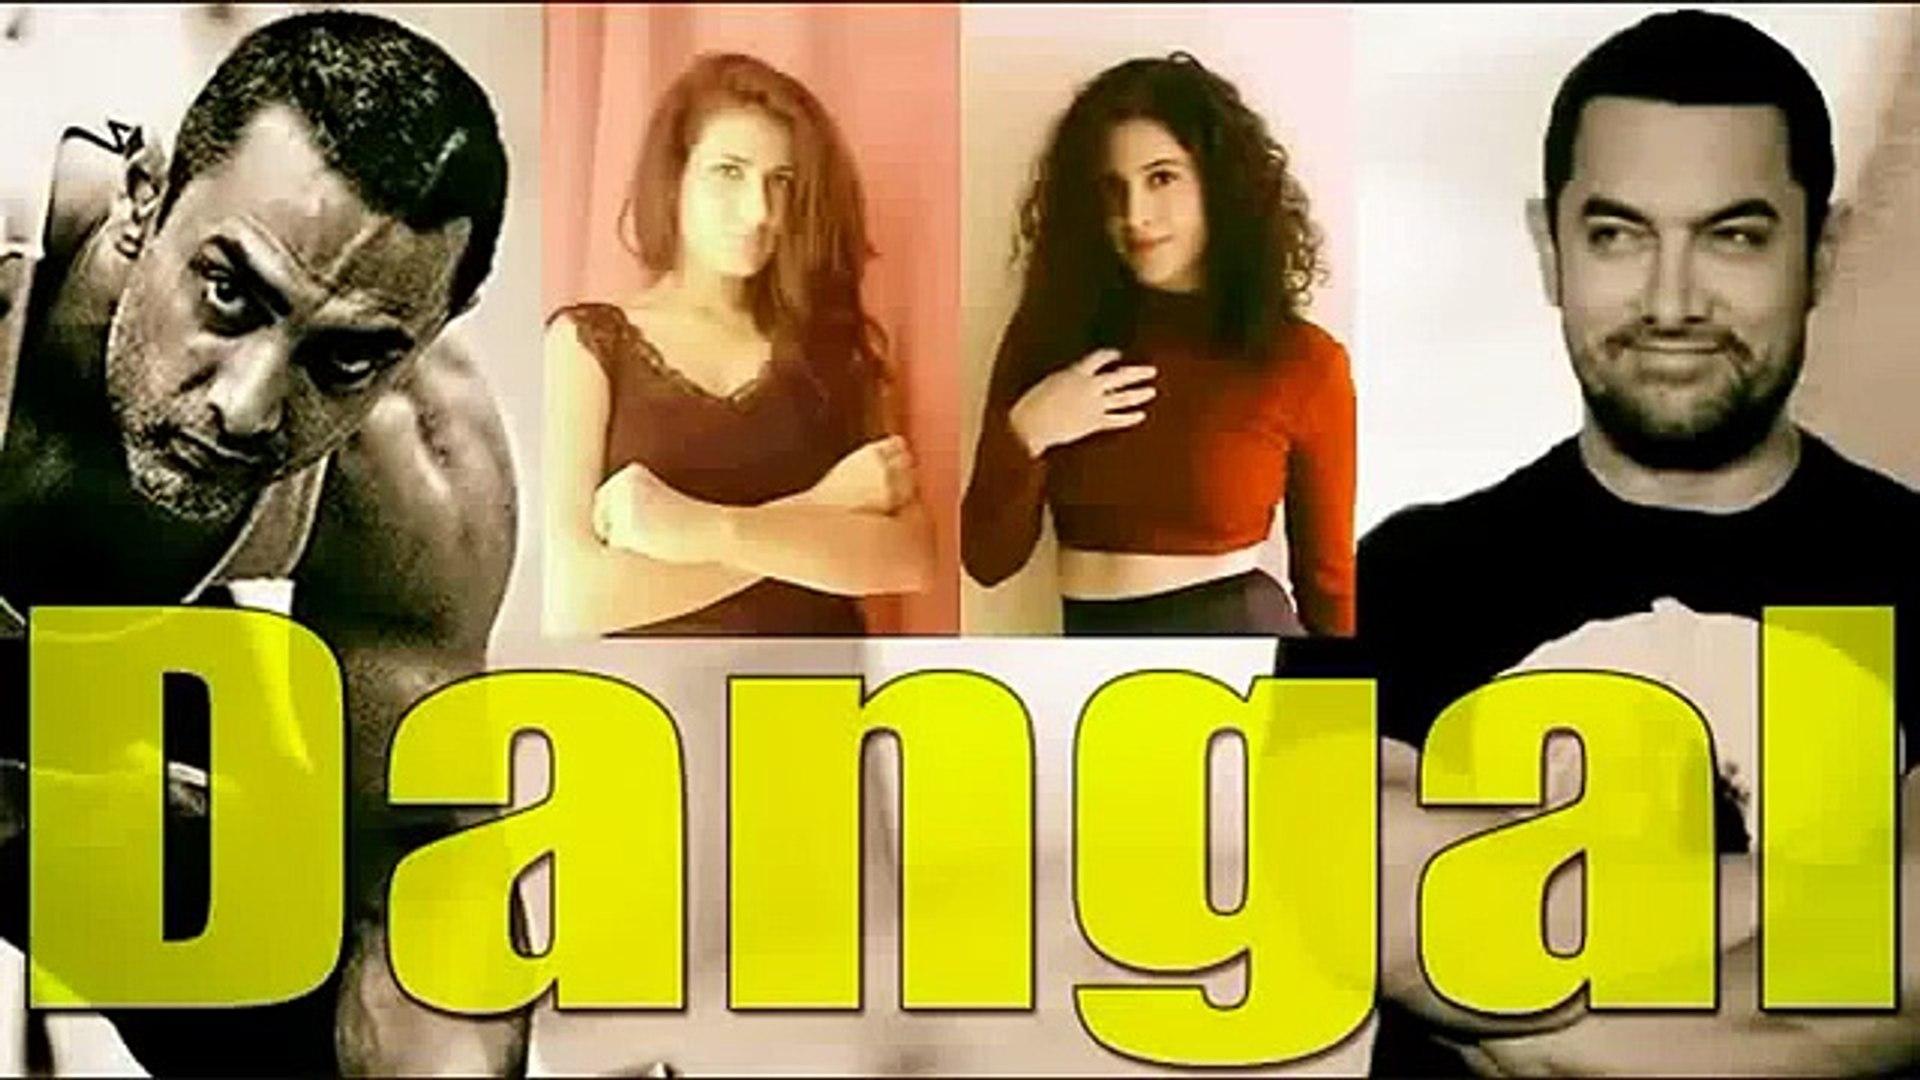 Dangal - 2016   Latest Bollywood Movie Full Trailer   Bollywood Movie Dangal Full Trailer - 2016 (Co